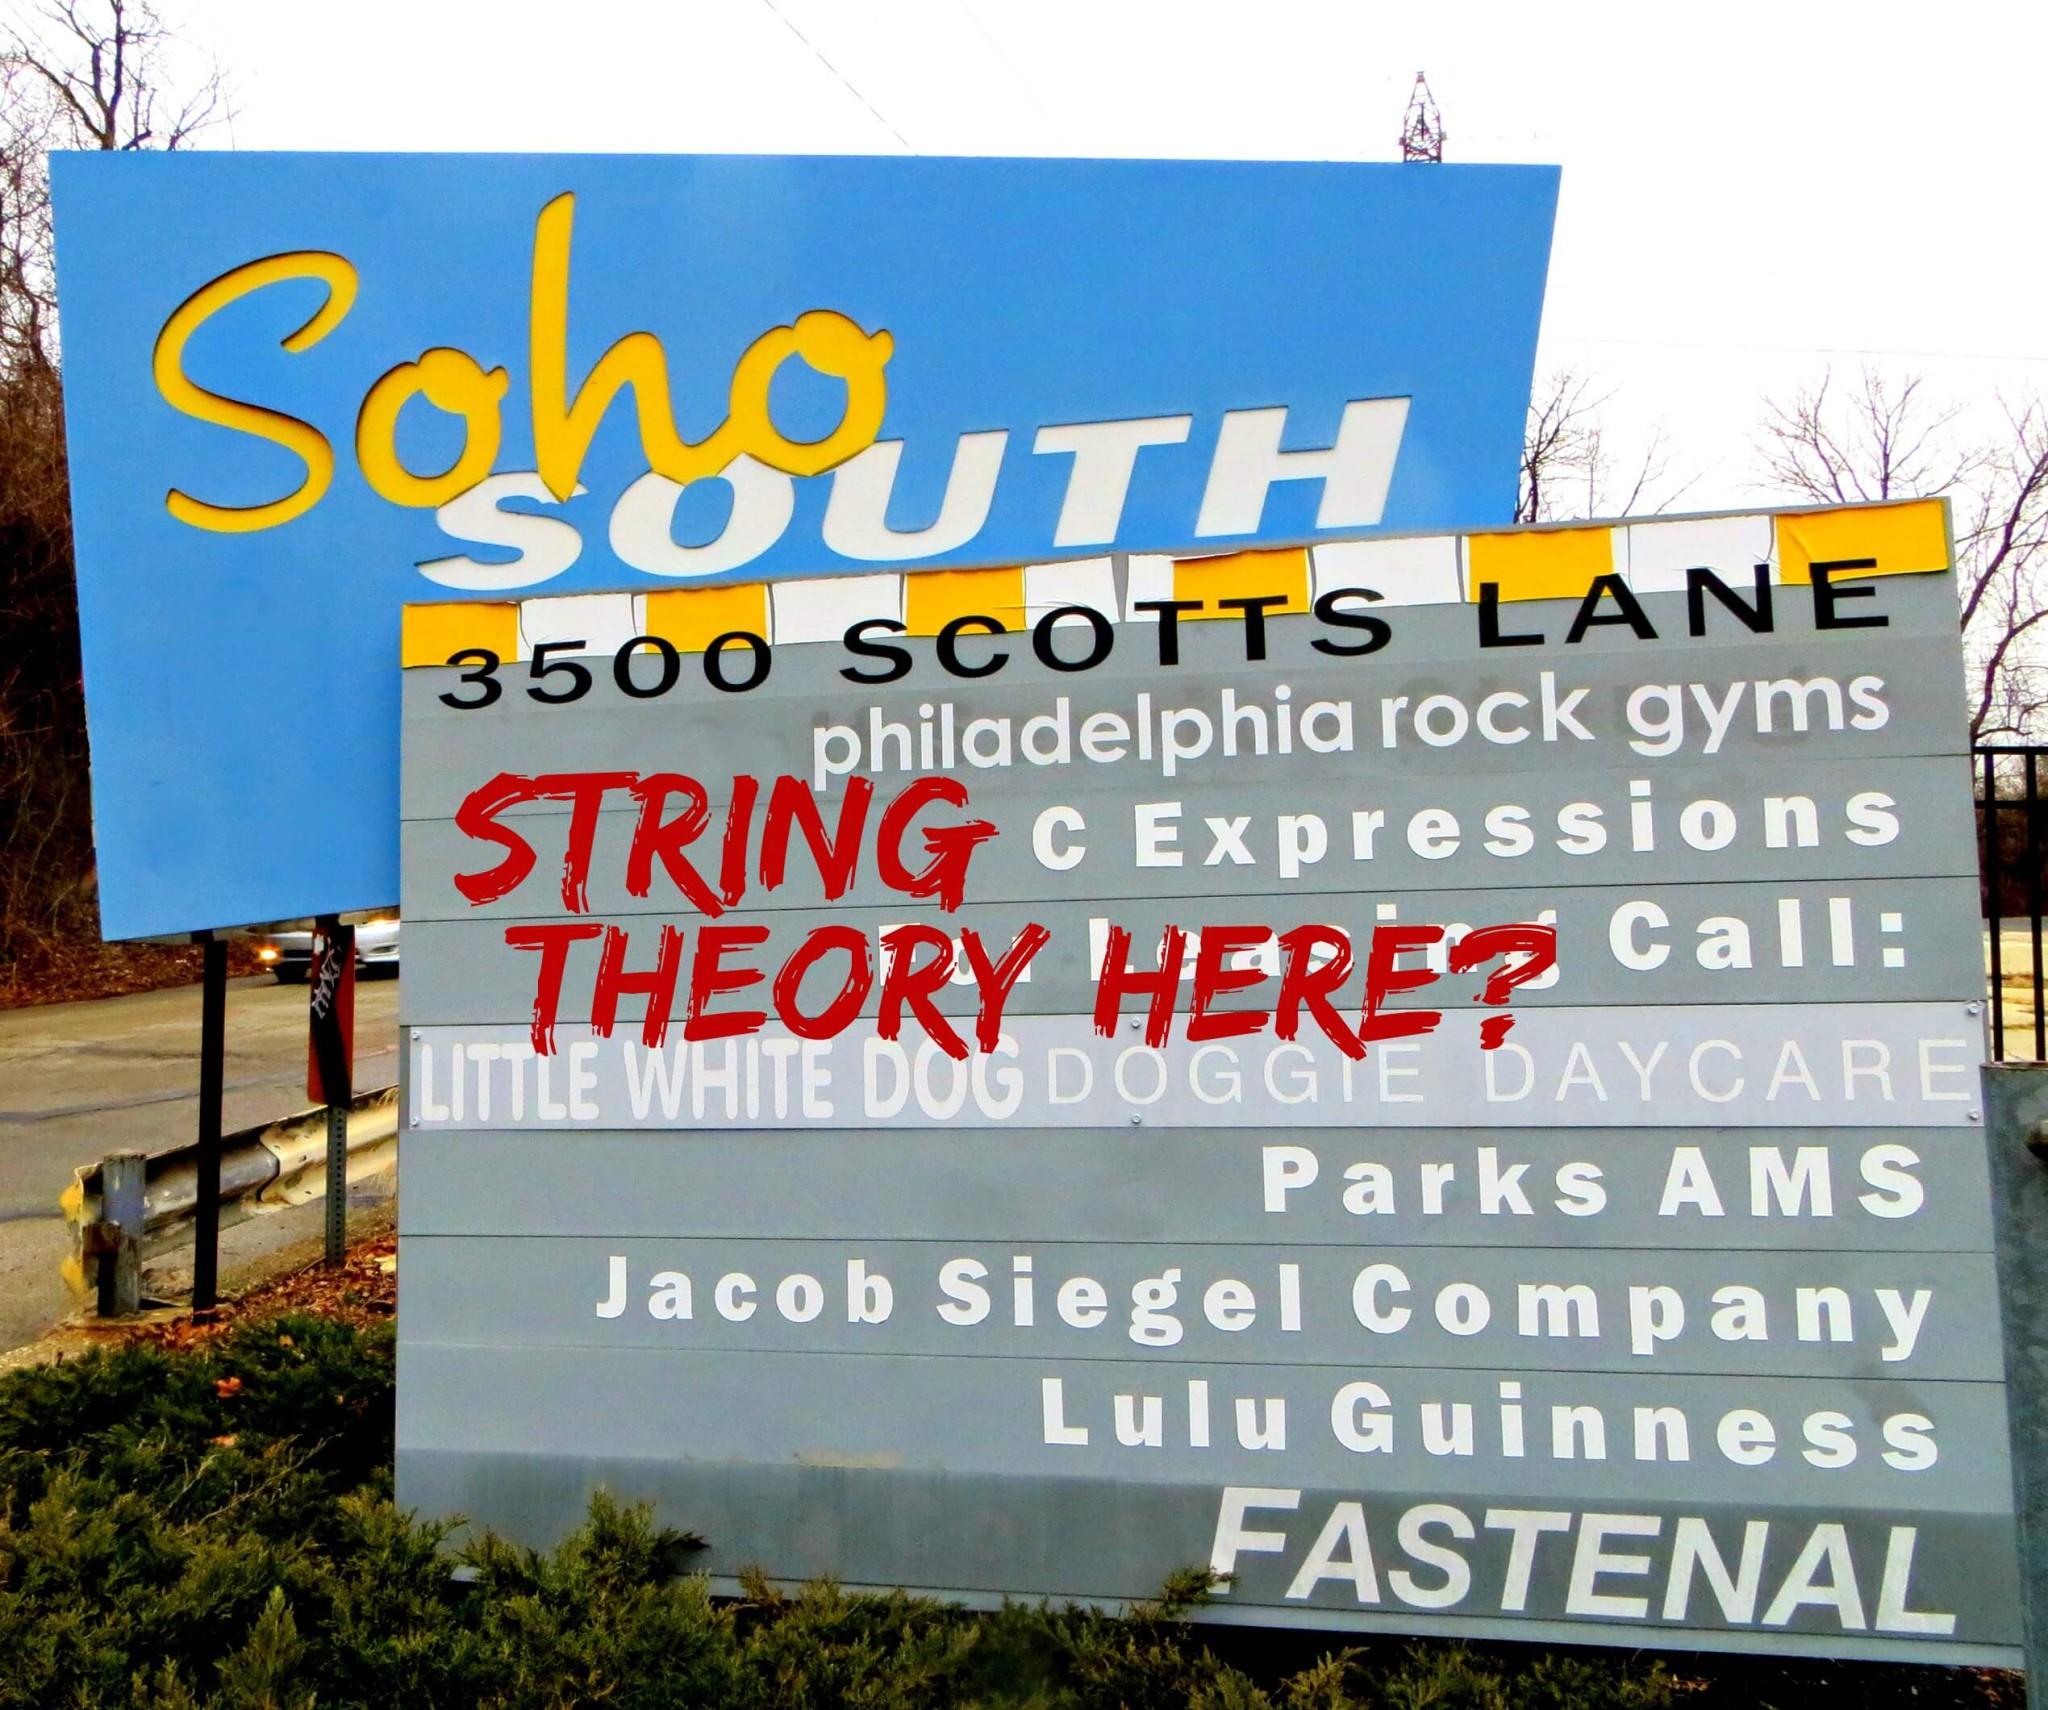 East Falls Local 2-9 SoHo South sign scotts lane